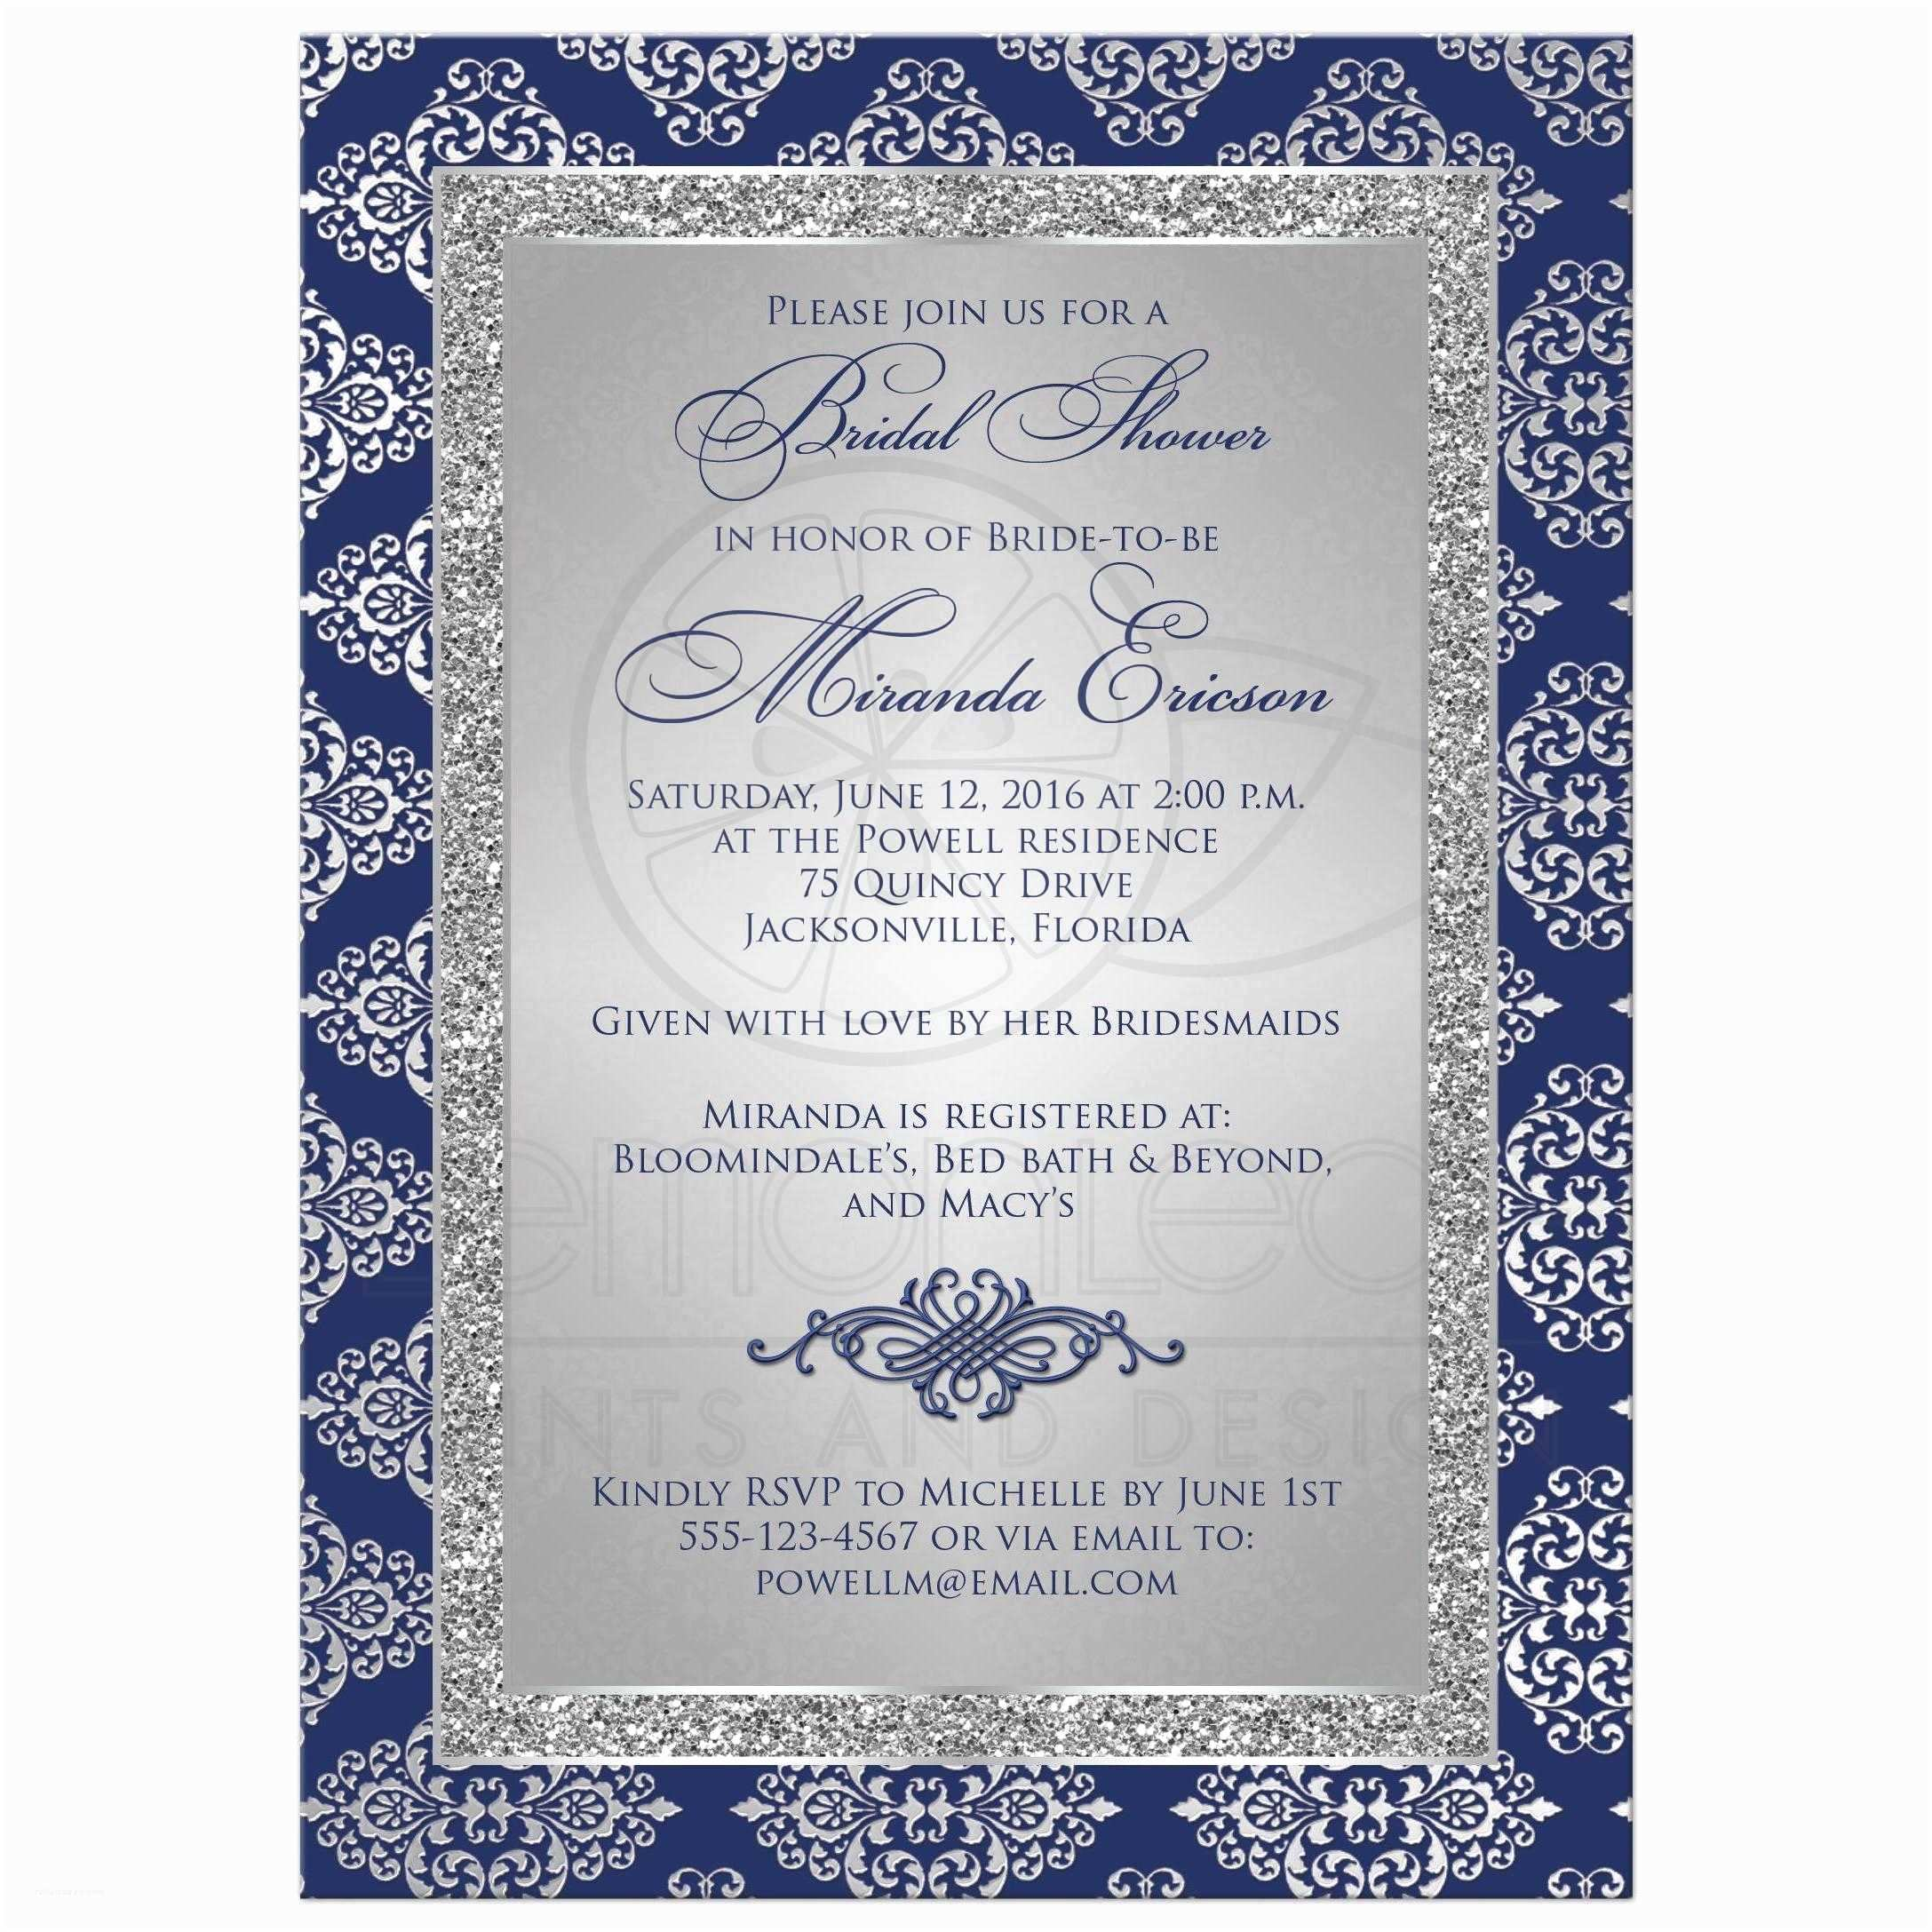 Blue and Silver Wedding Invitations Bridal Shower Invitation